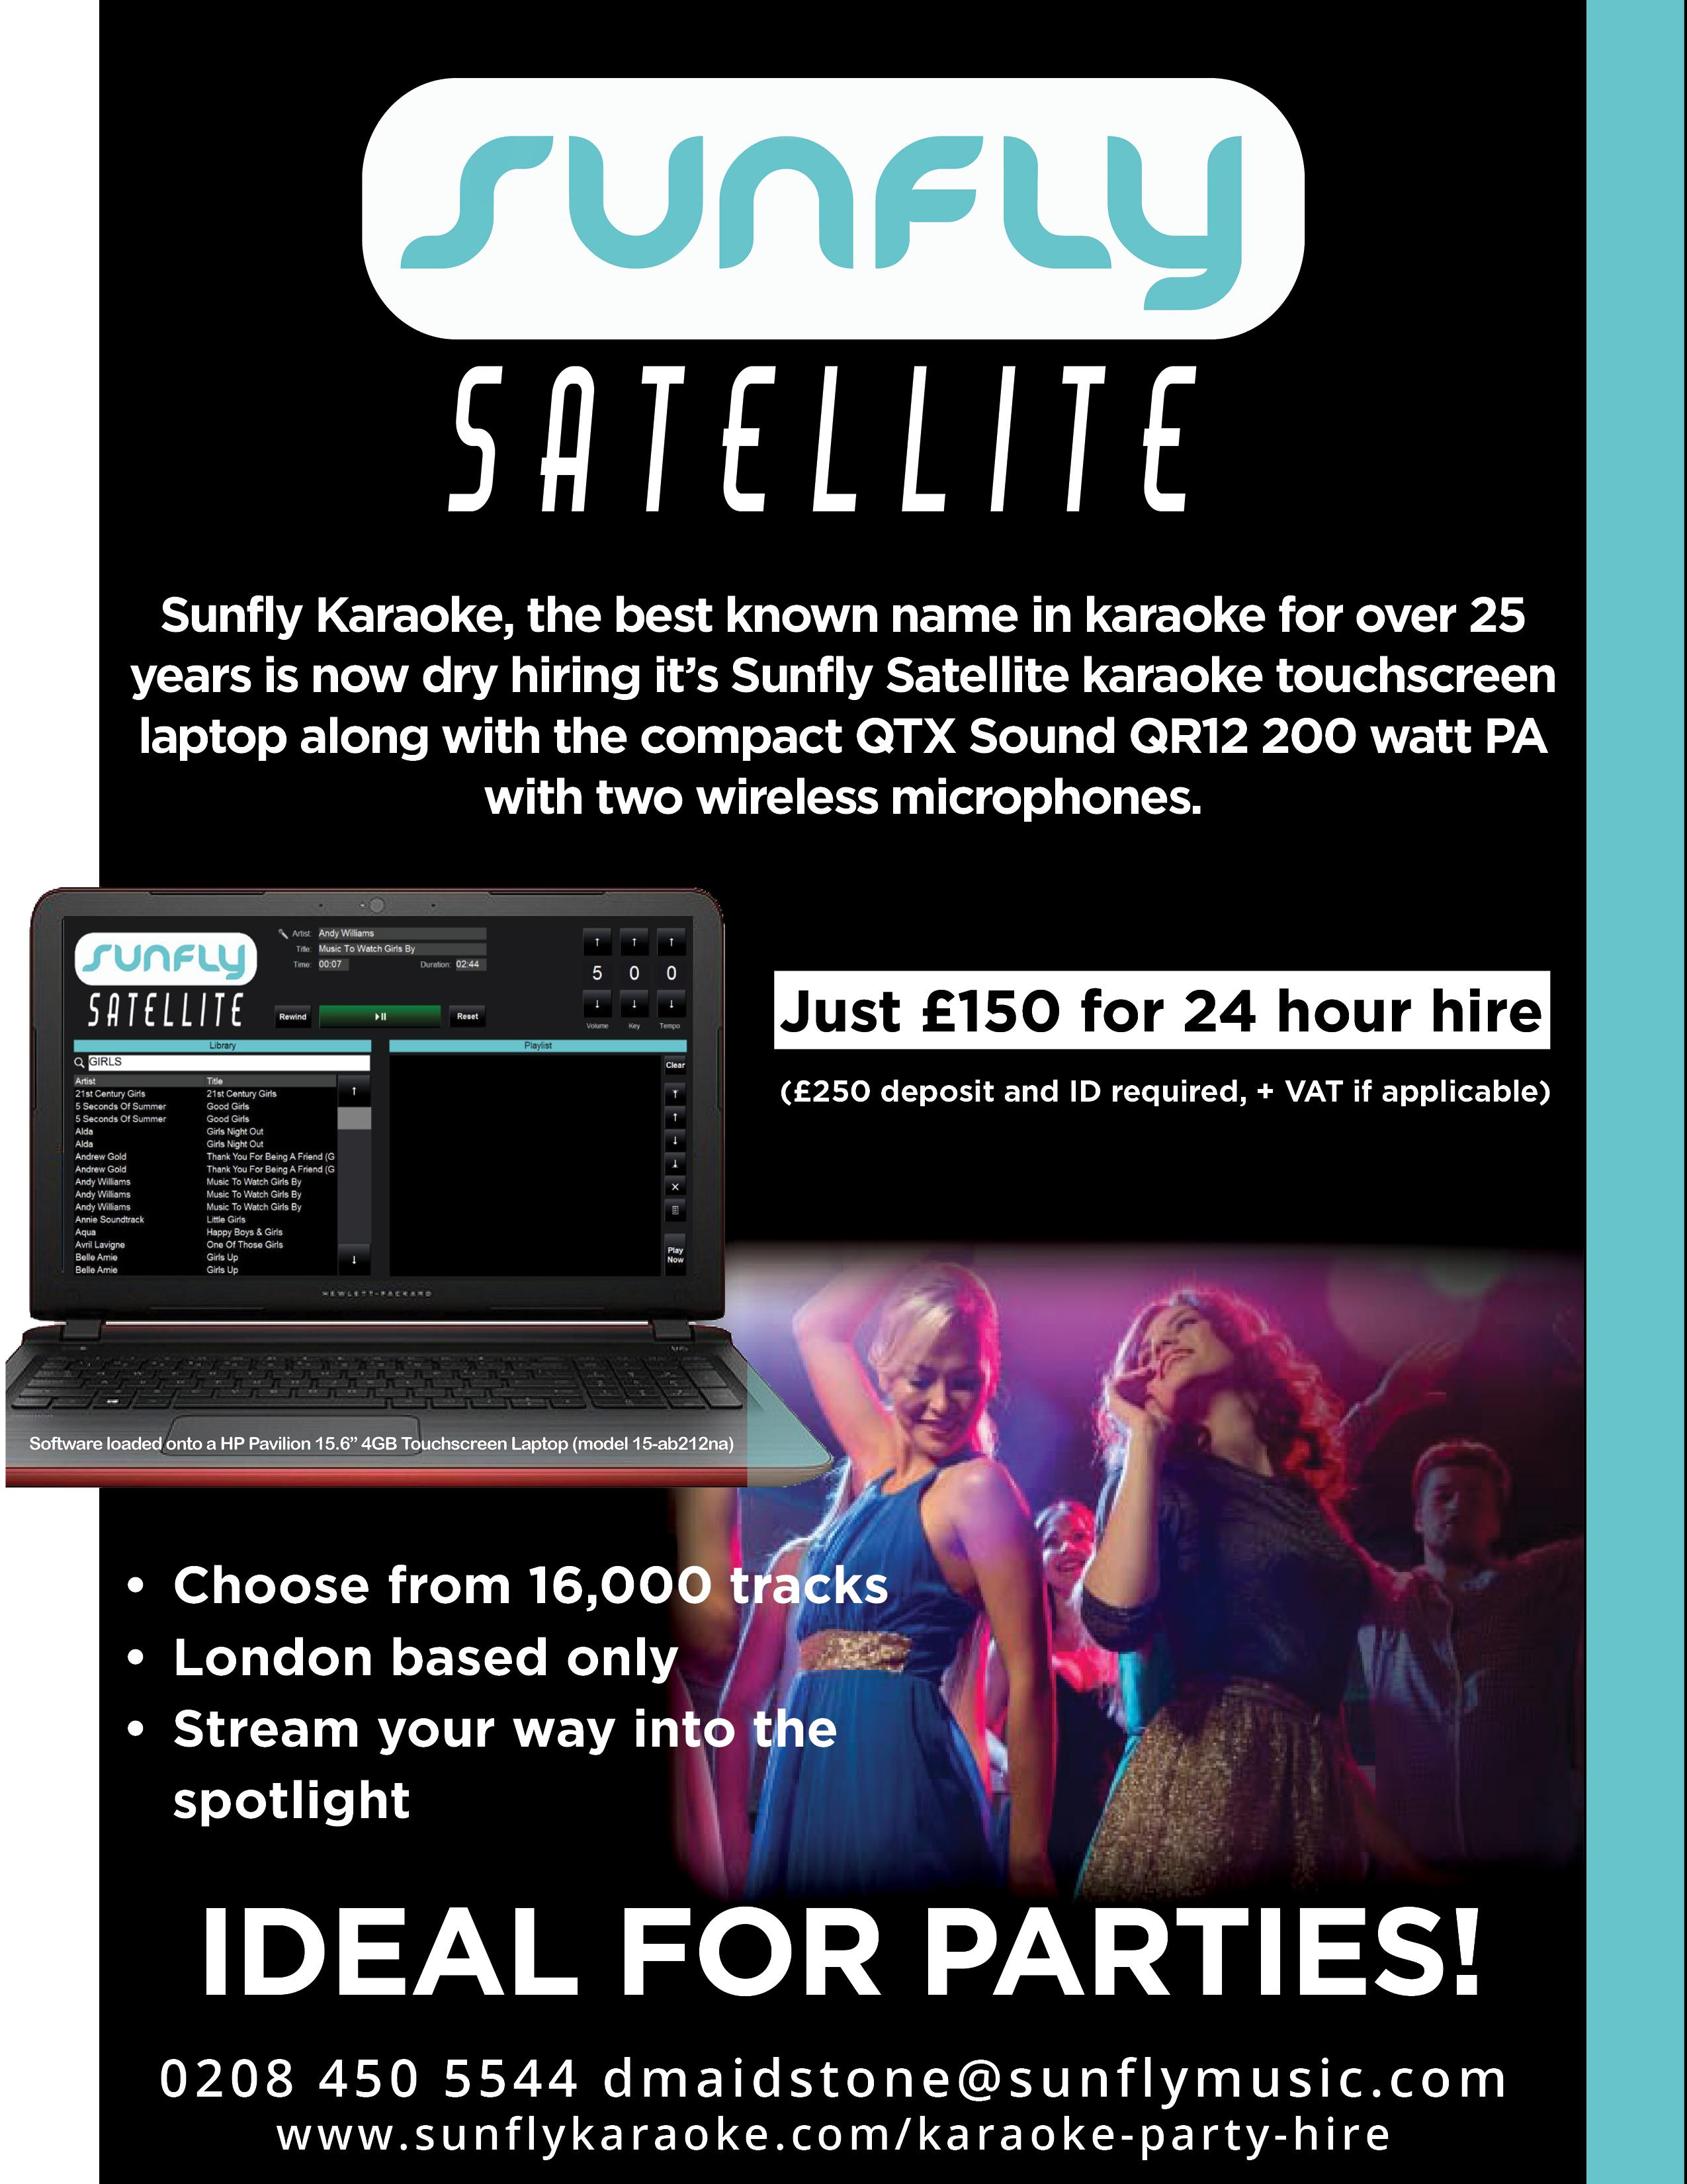 karaoke-party-hire